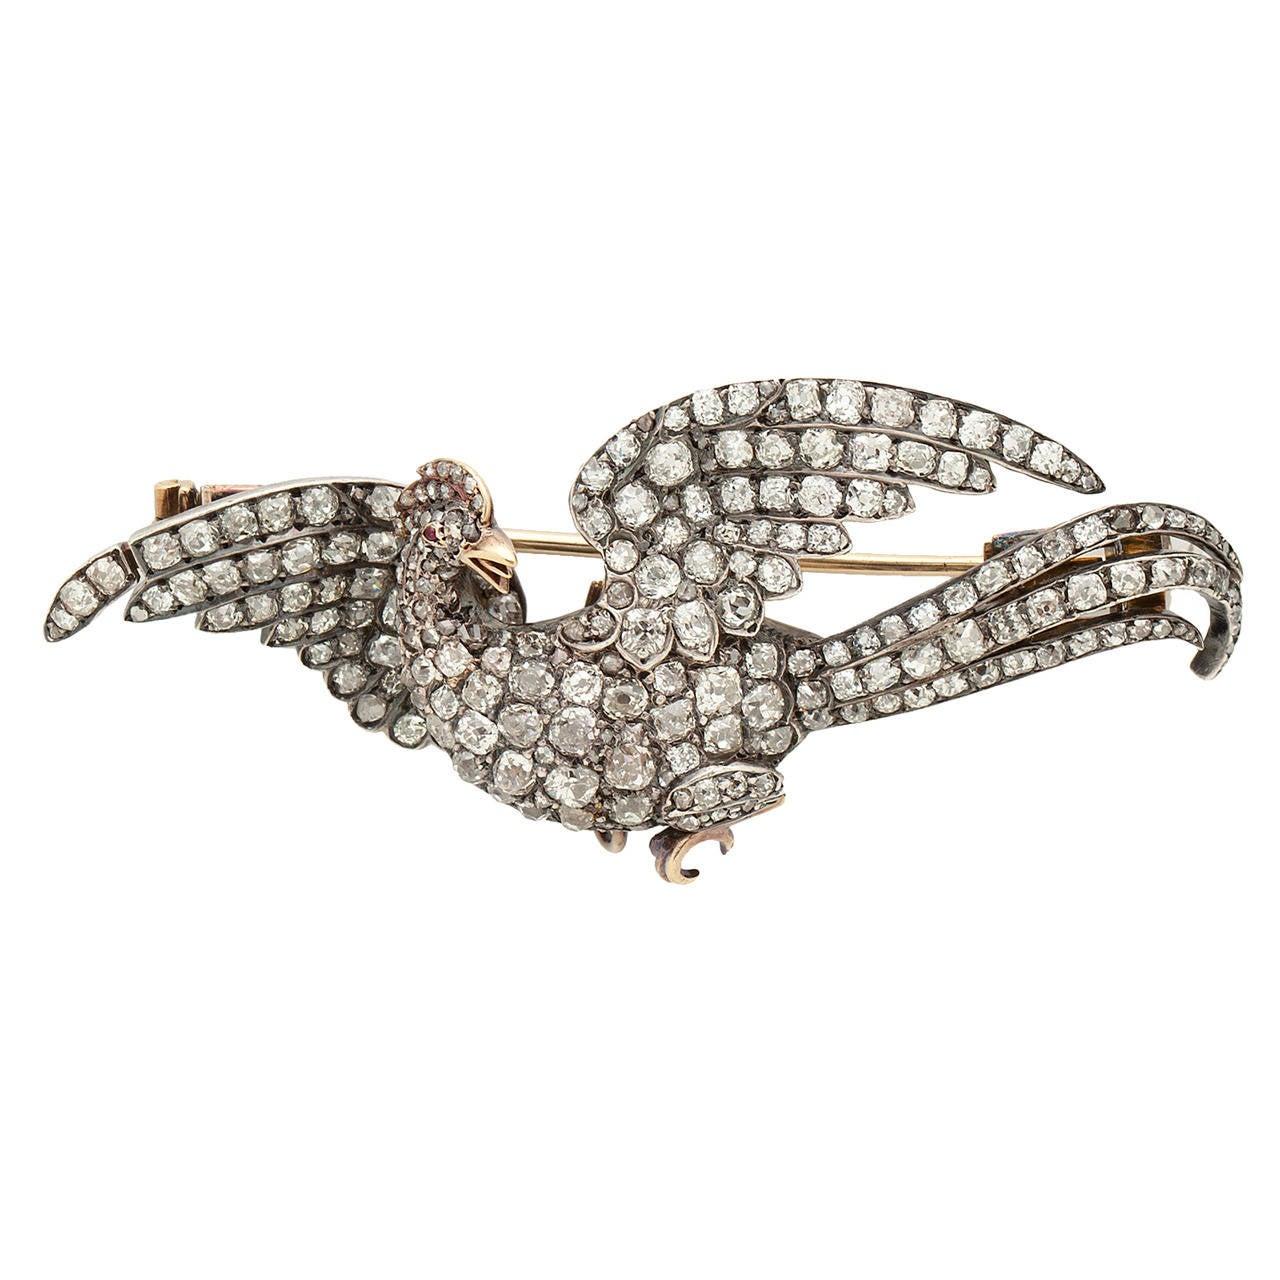 Antique Stylized Diamond Silver Gold Phoenix Brooch